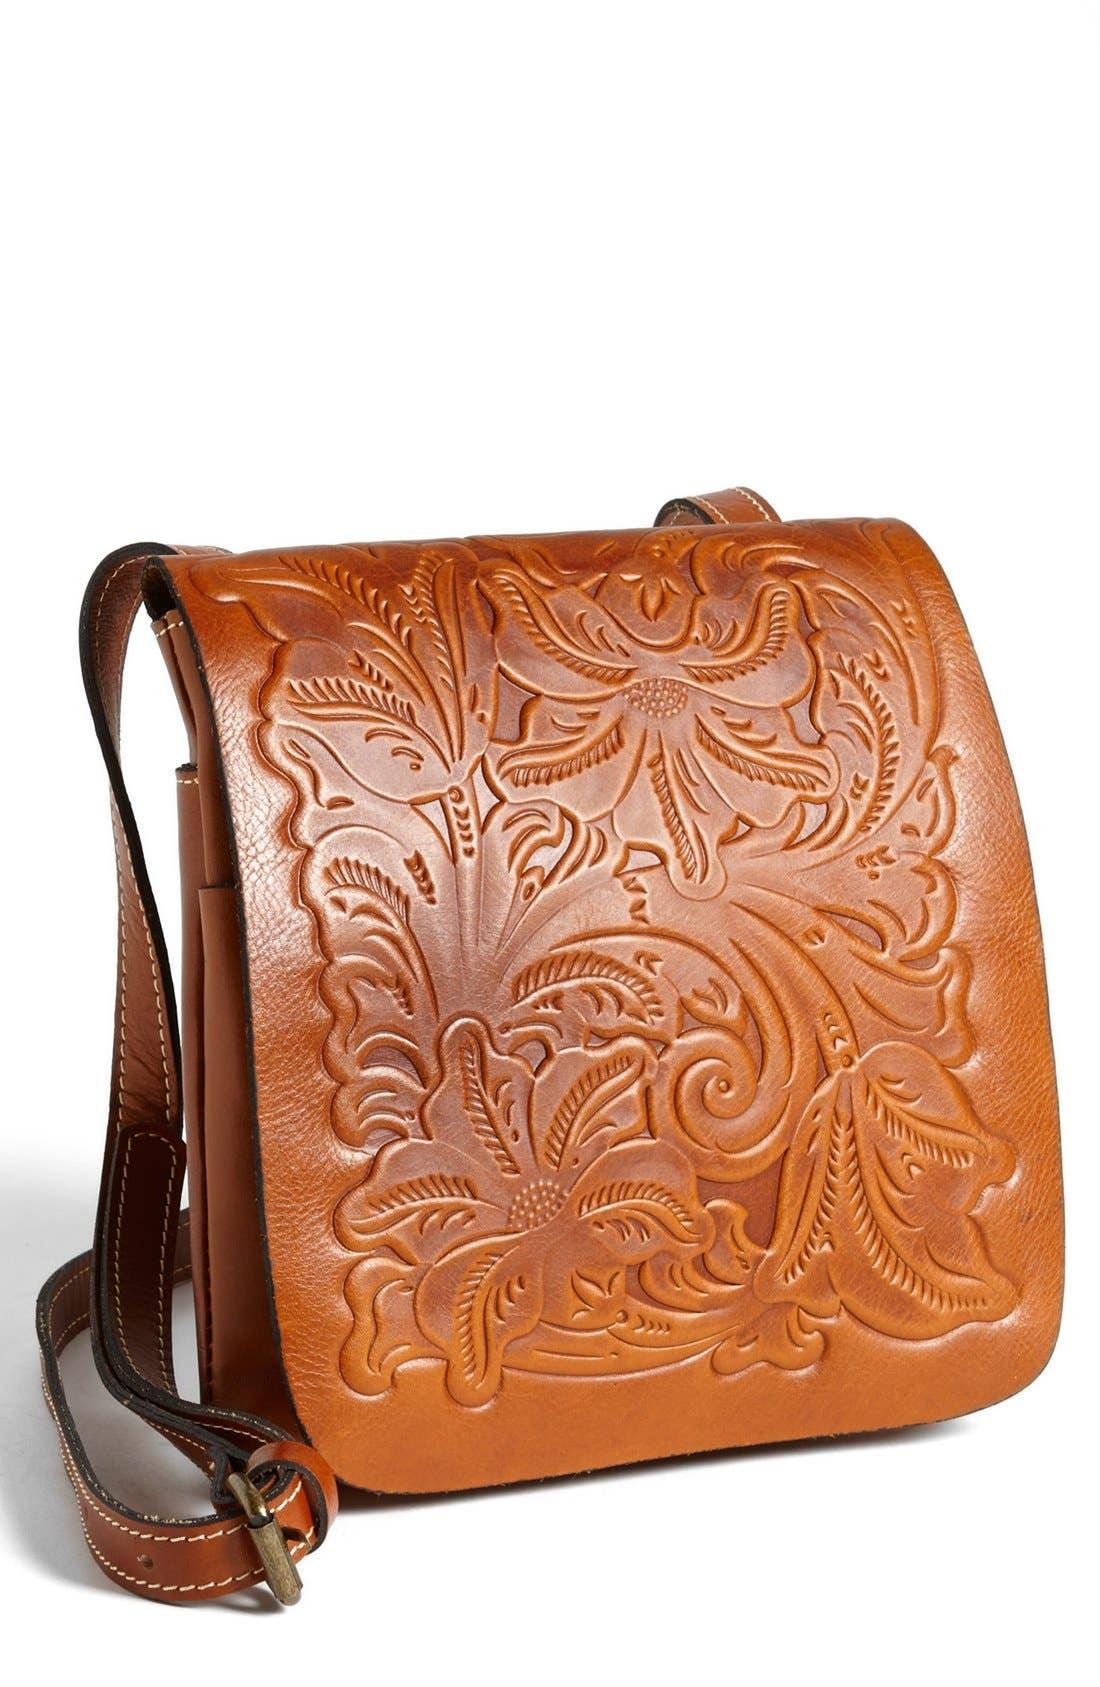 Alternate Image 1 Selected - Patricia Nash 'Granada' Embossed Leather Crossbody Bag